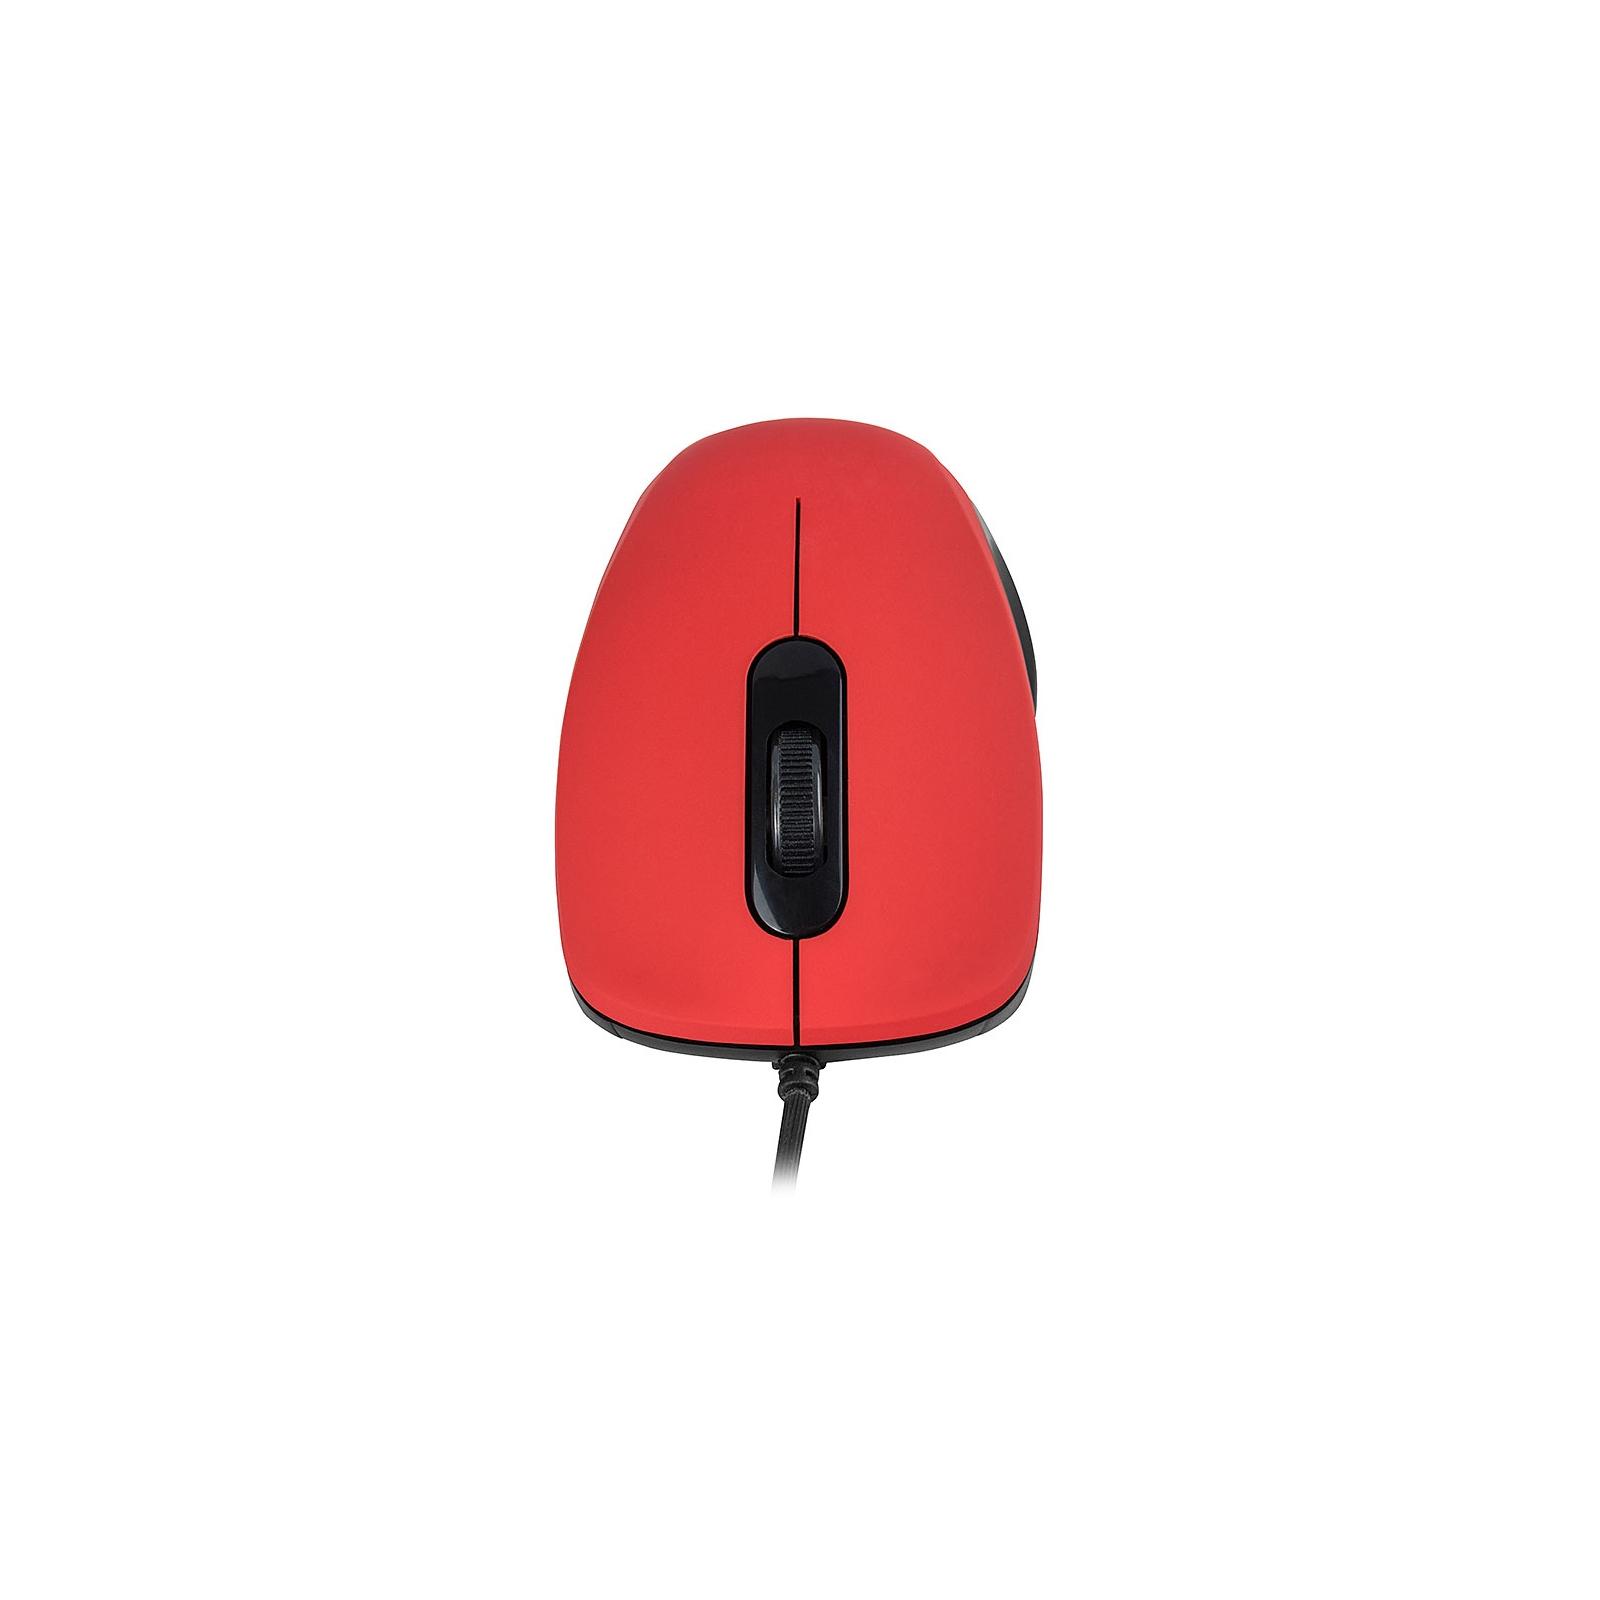 Мышка Modecom MC-M10S Silent USB Black (M-MC-M10S-100) изображение 5